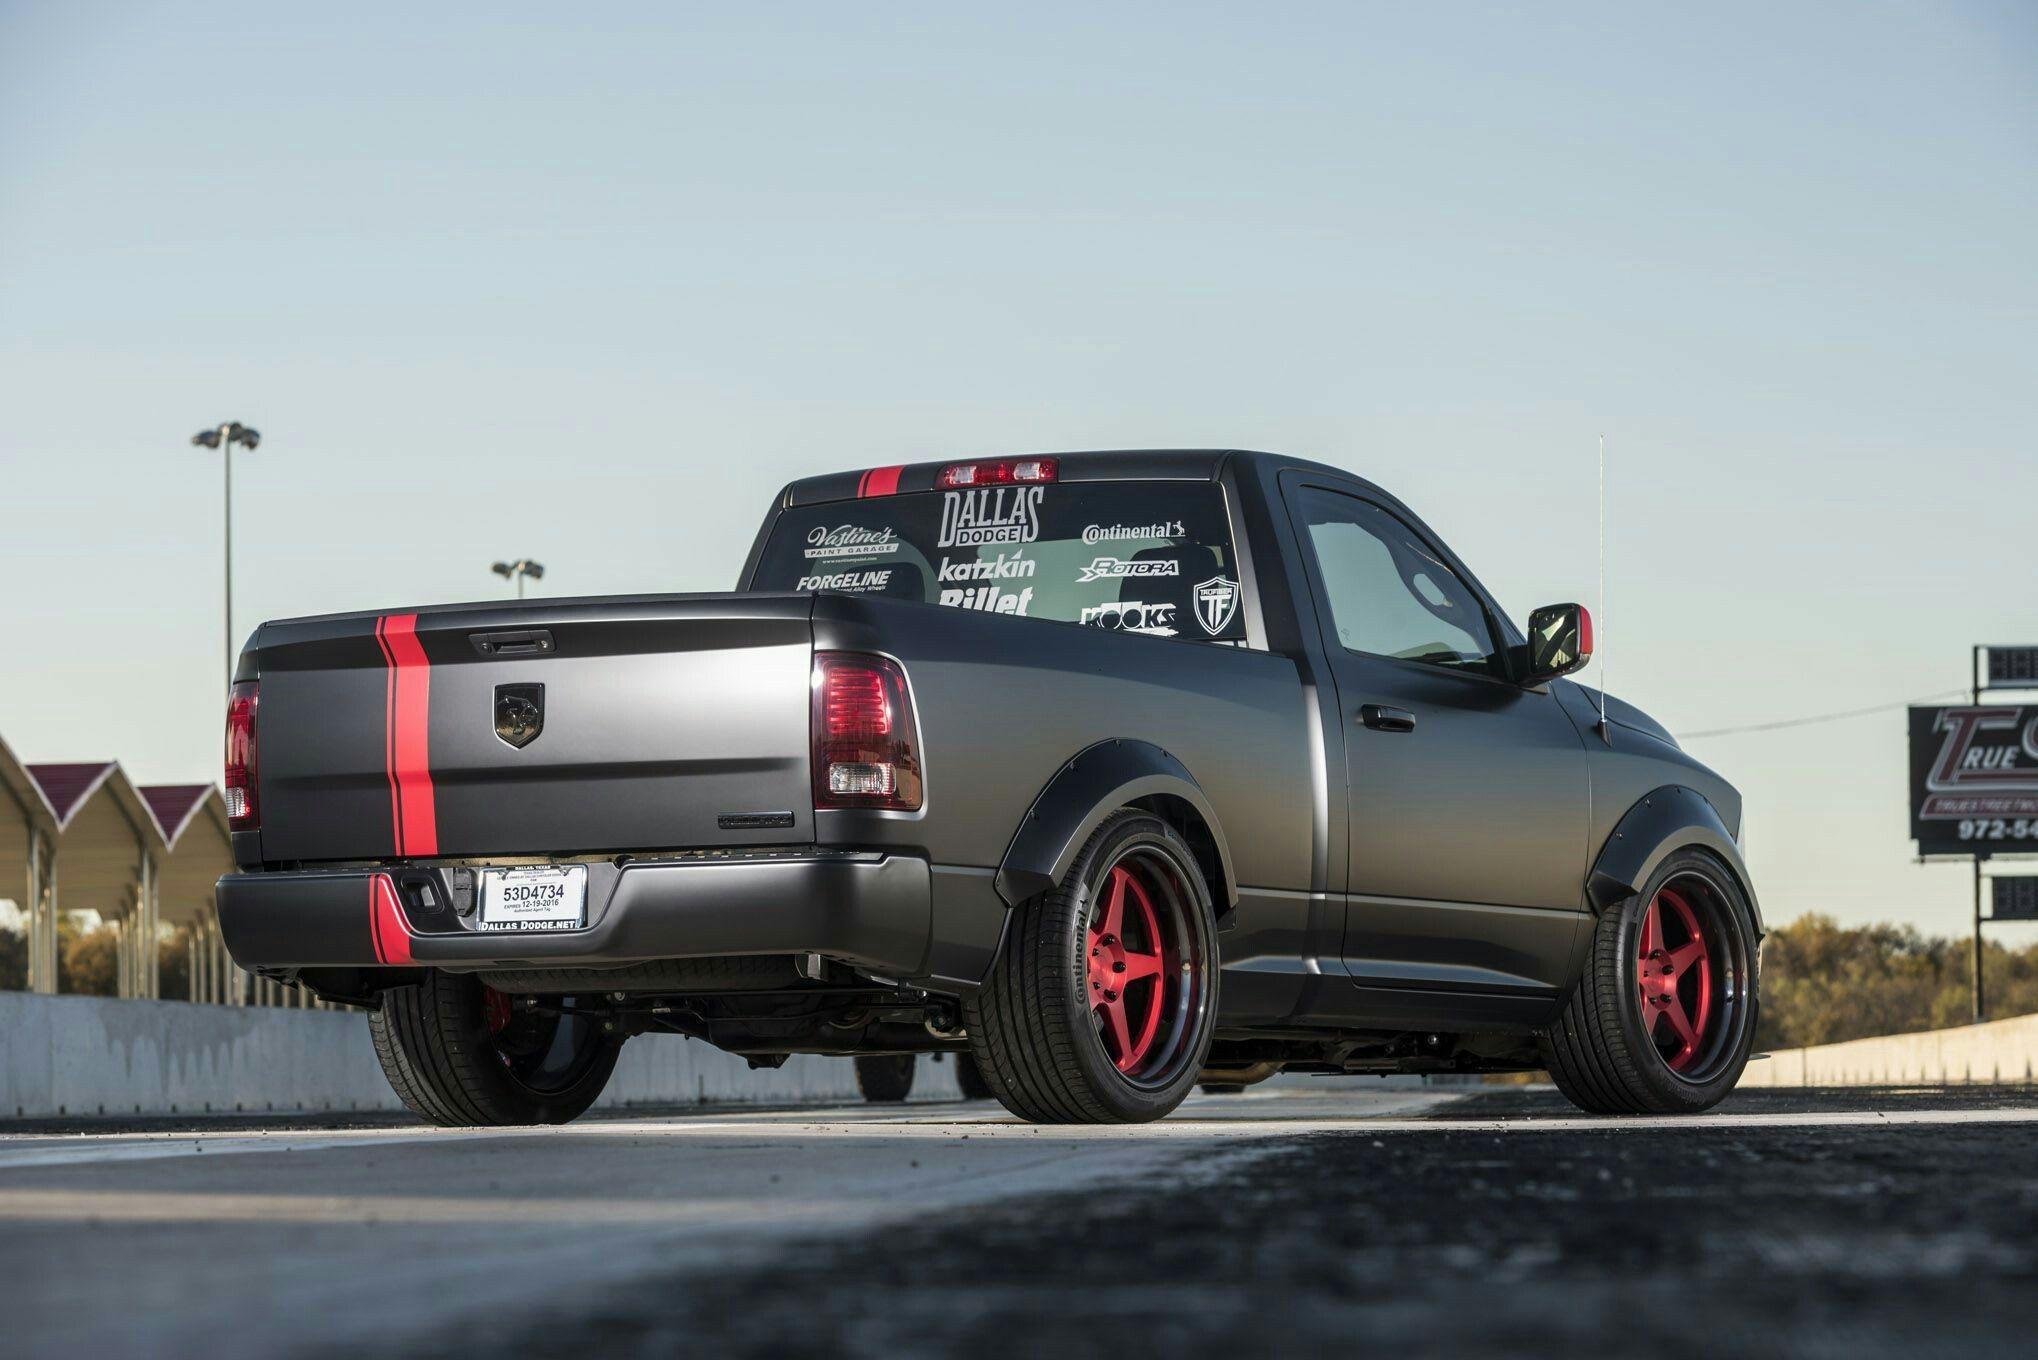 2016 Ram 1500 Hellfire Sport truck, Dodge trucks